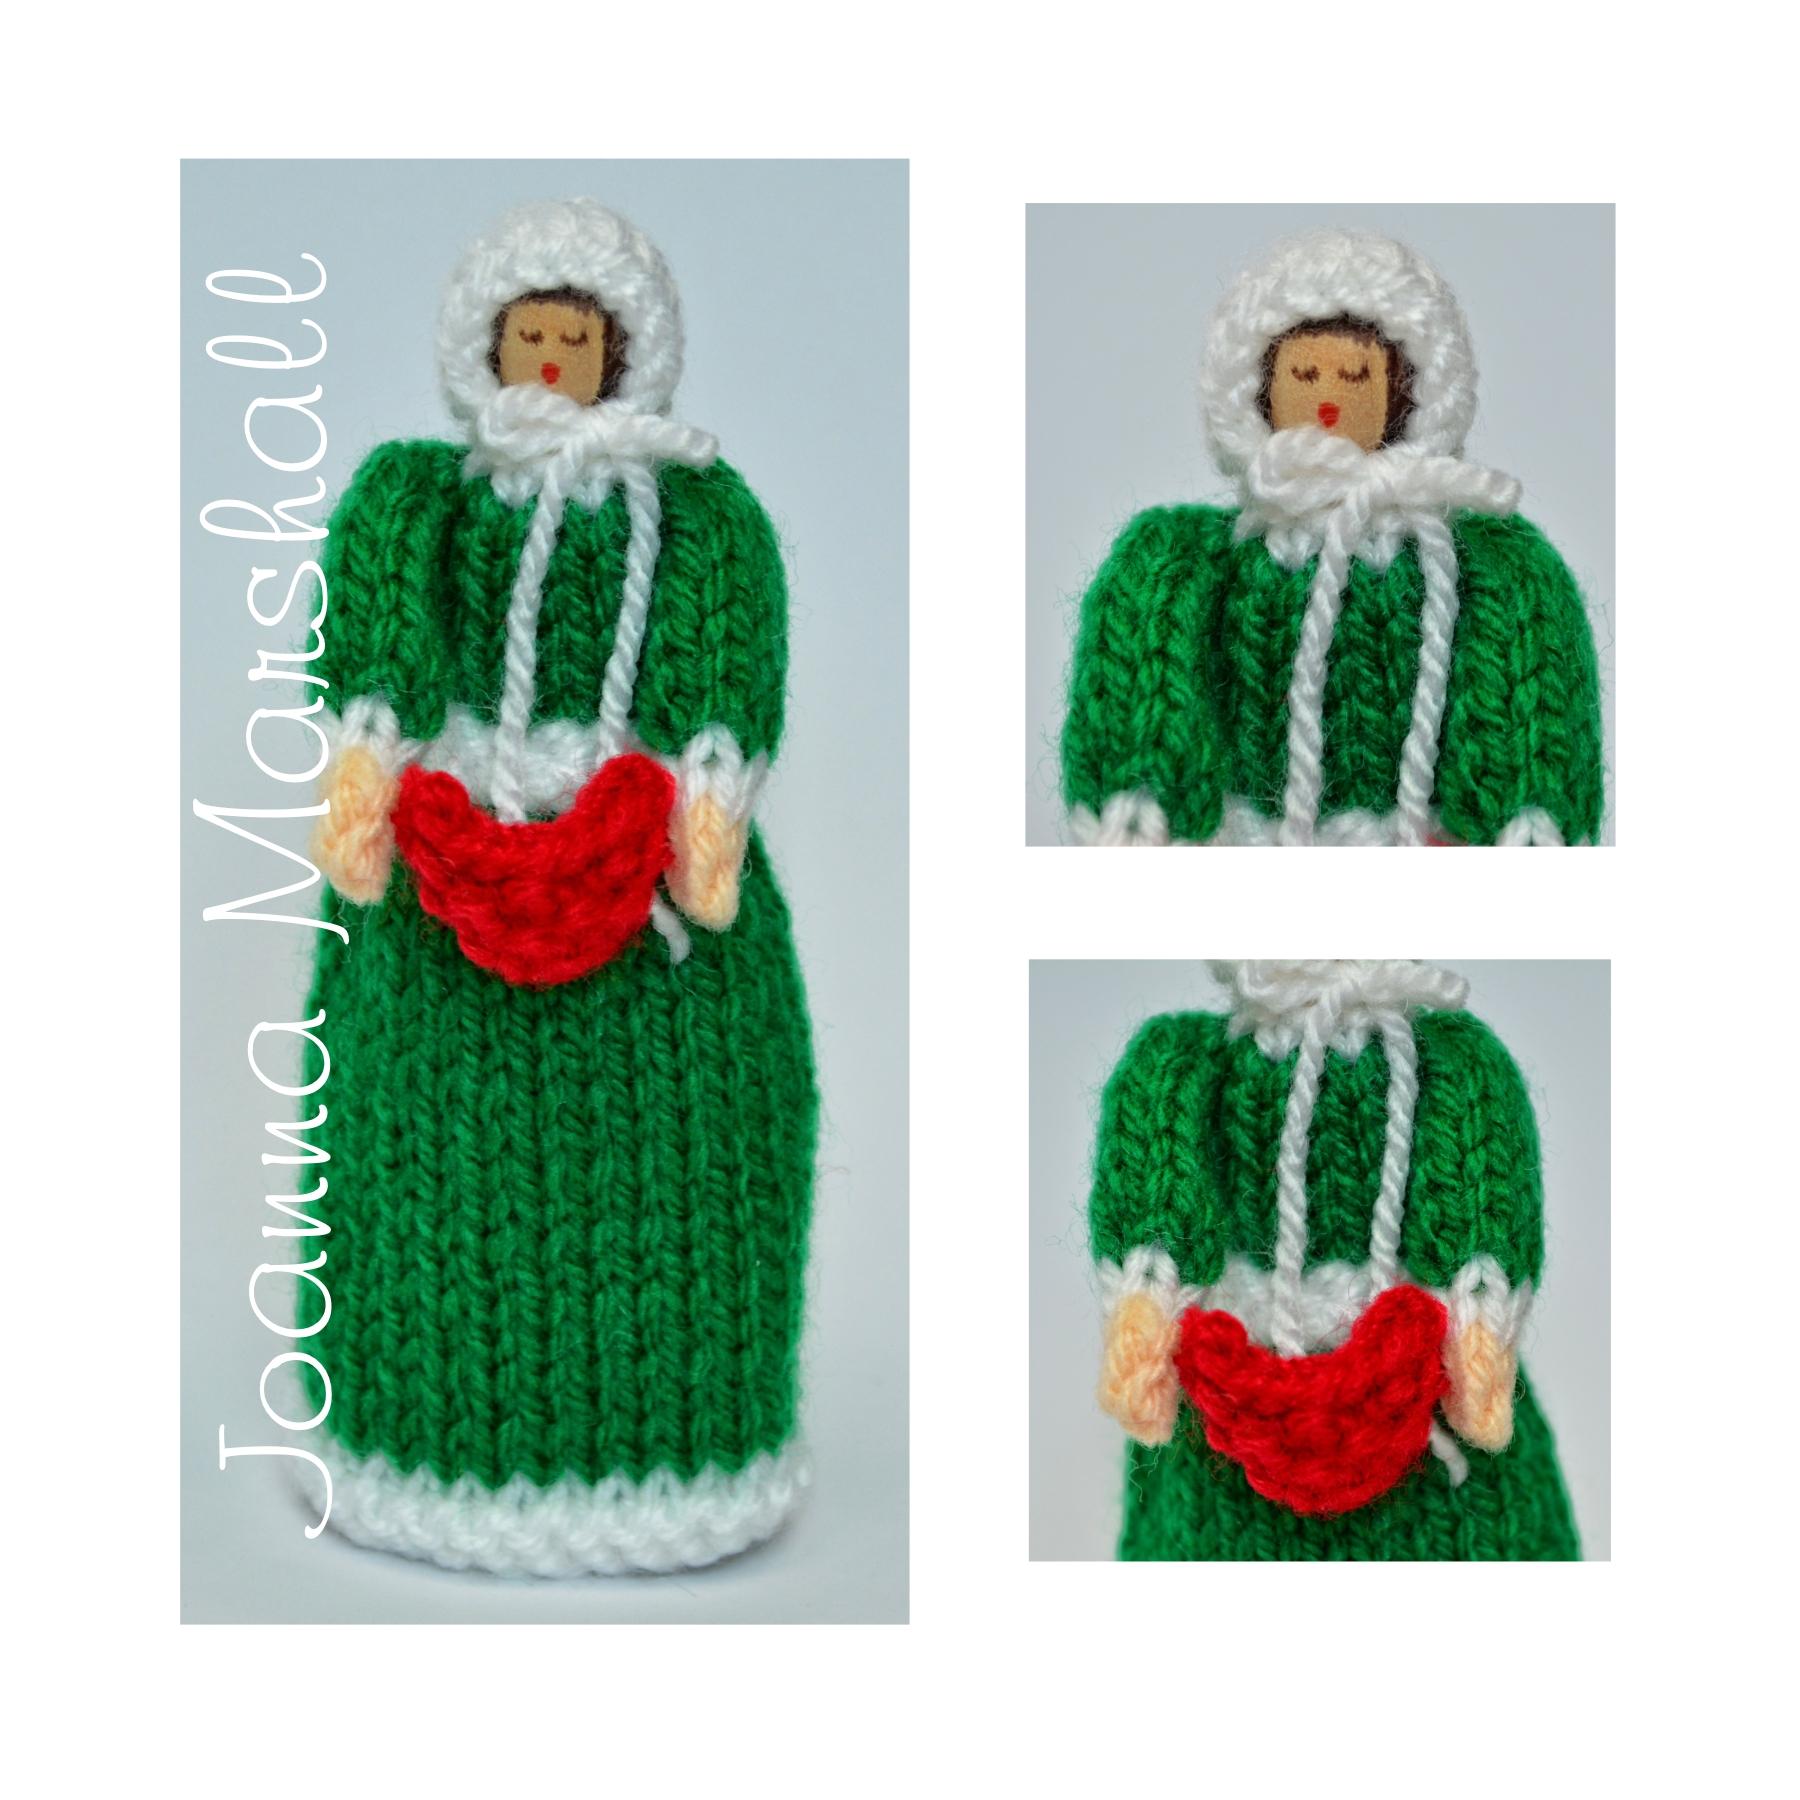 Christmas Carol Singer Peg Doll Knitting Pattern